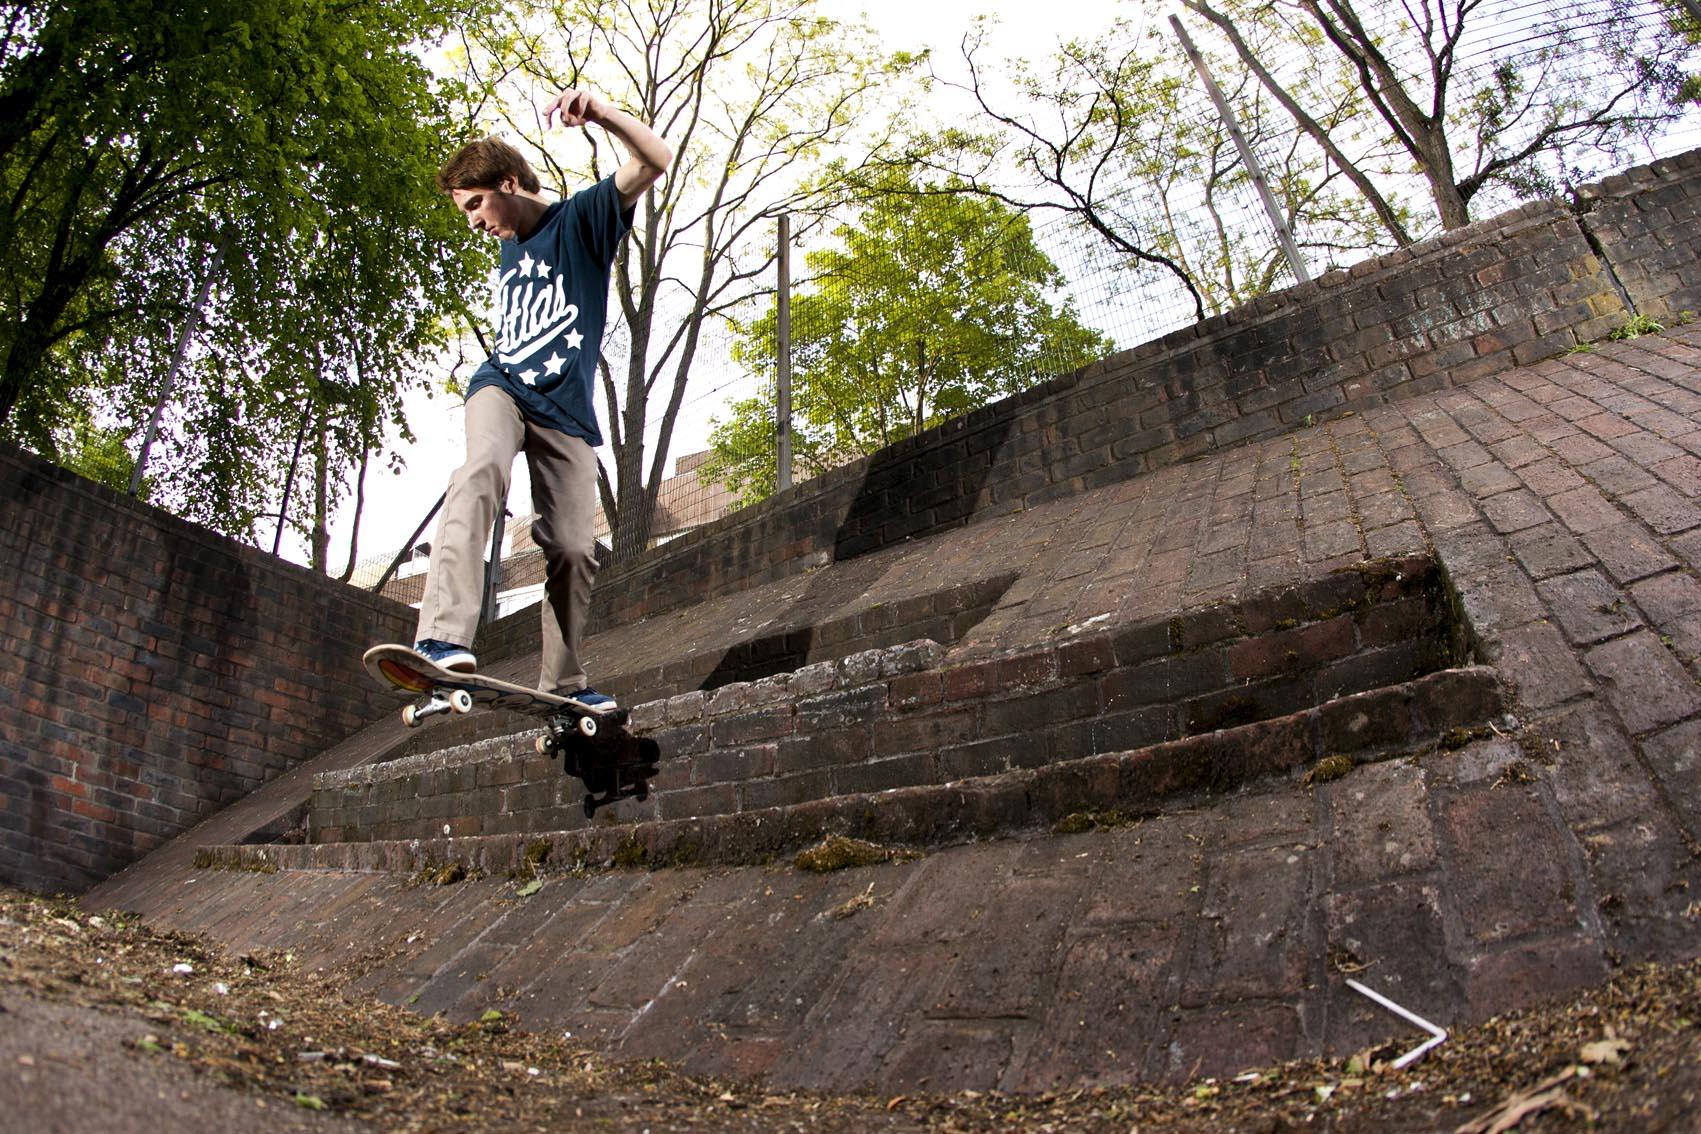 Mark Suciu - bank to bank backside tailslide